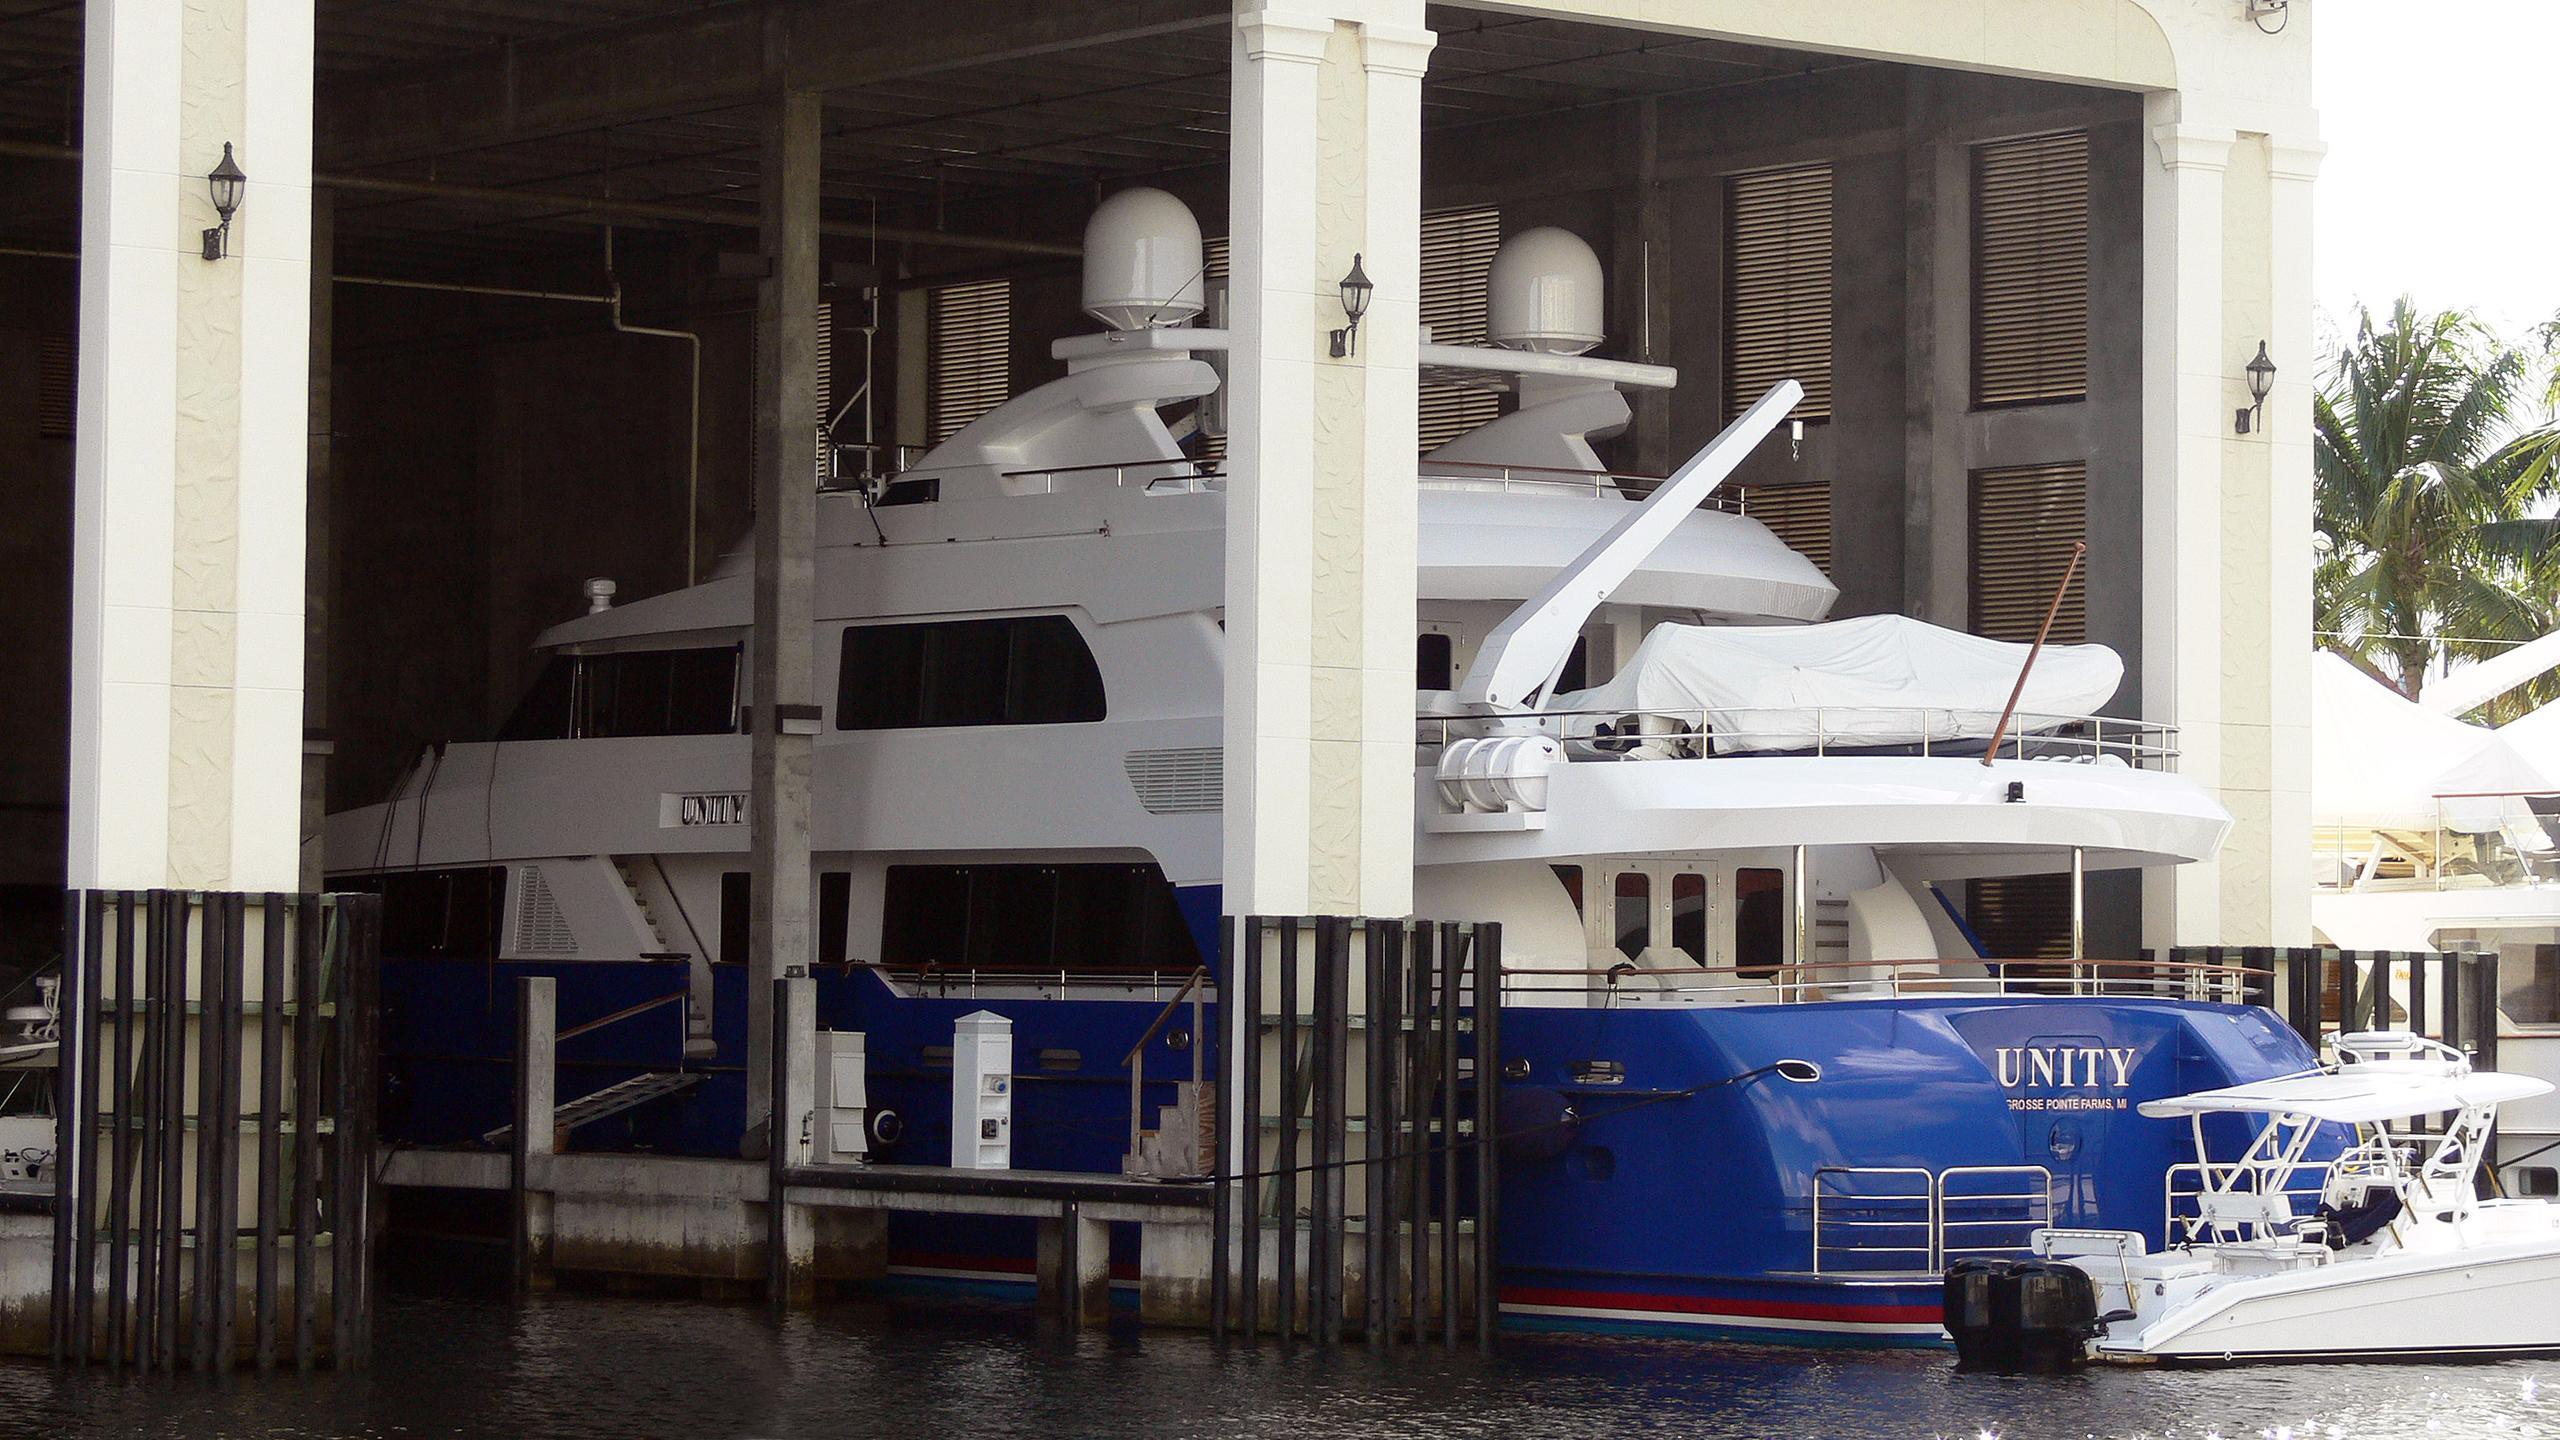 unity-motor-yacht-palmer-johnson-2004-40m-covered-yard-half-profile